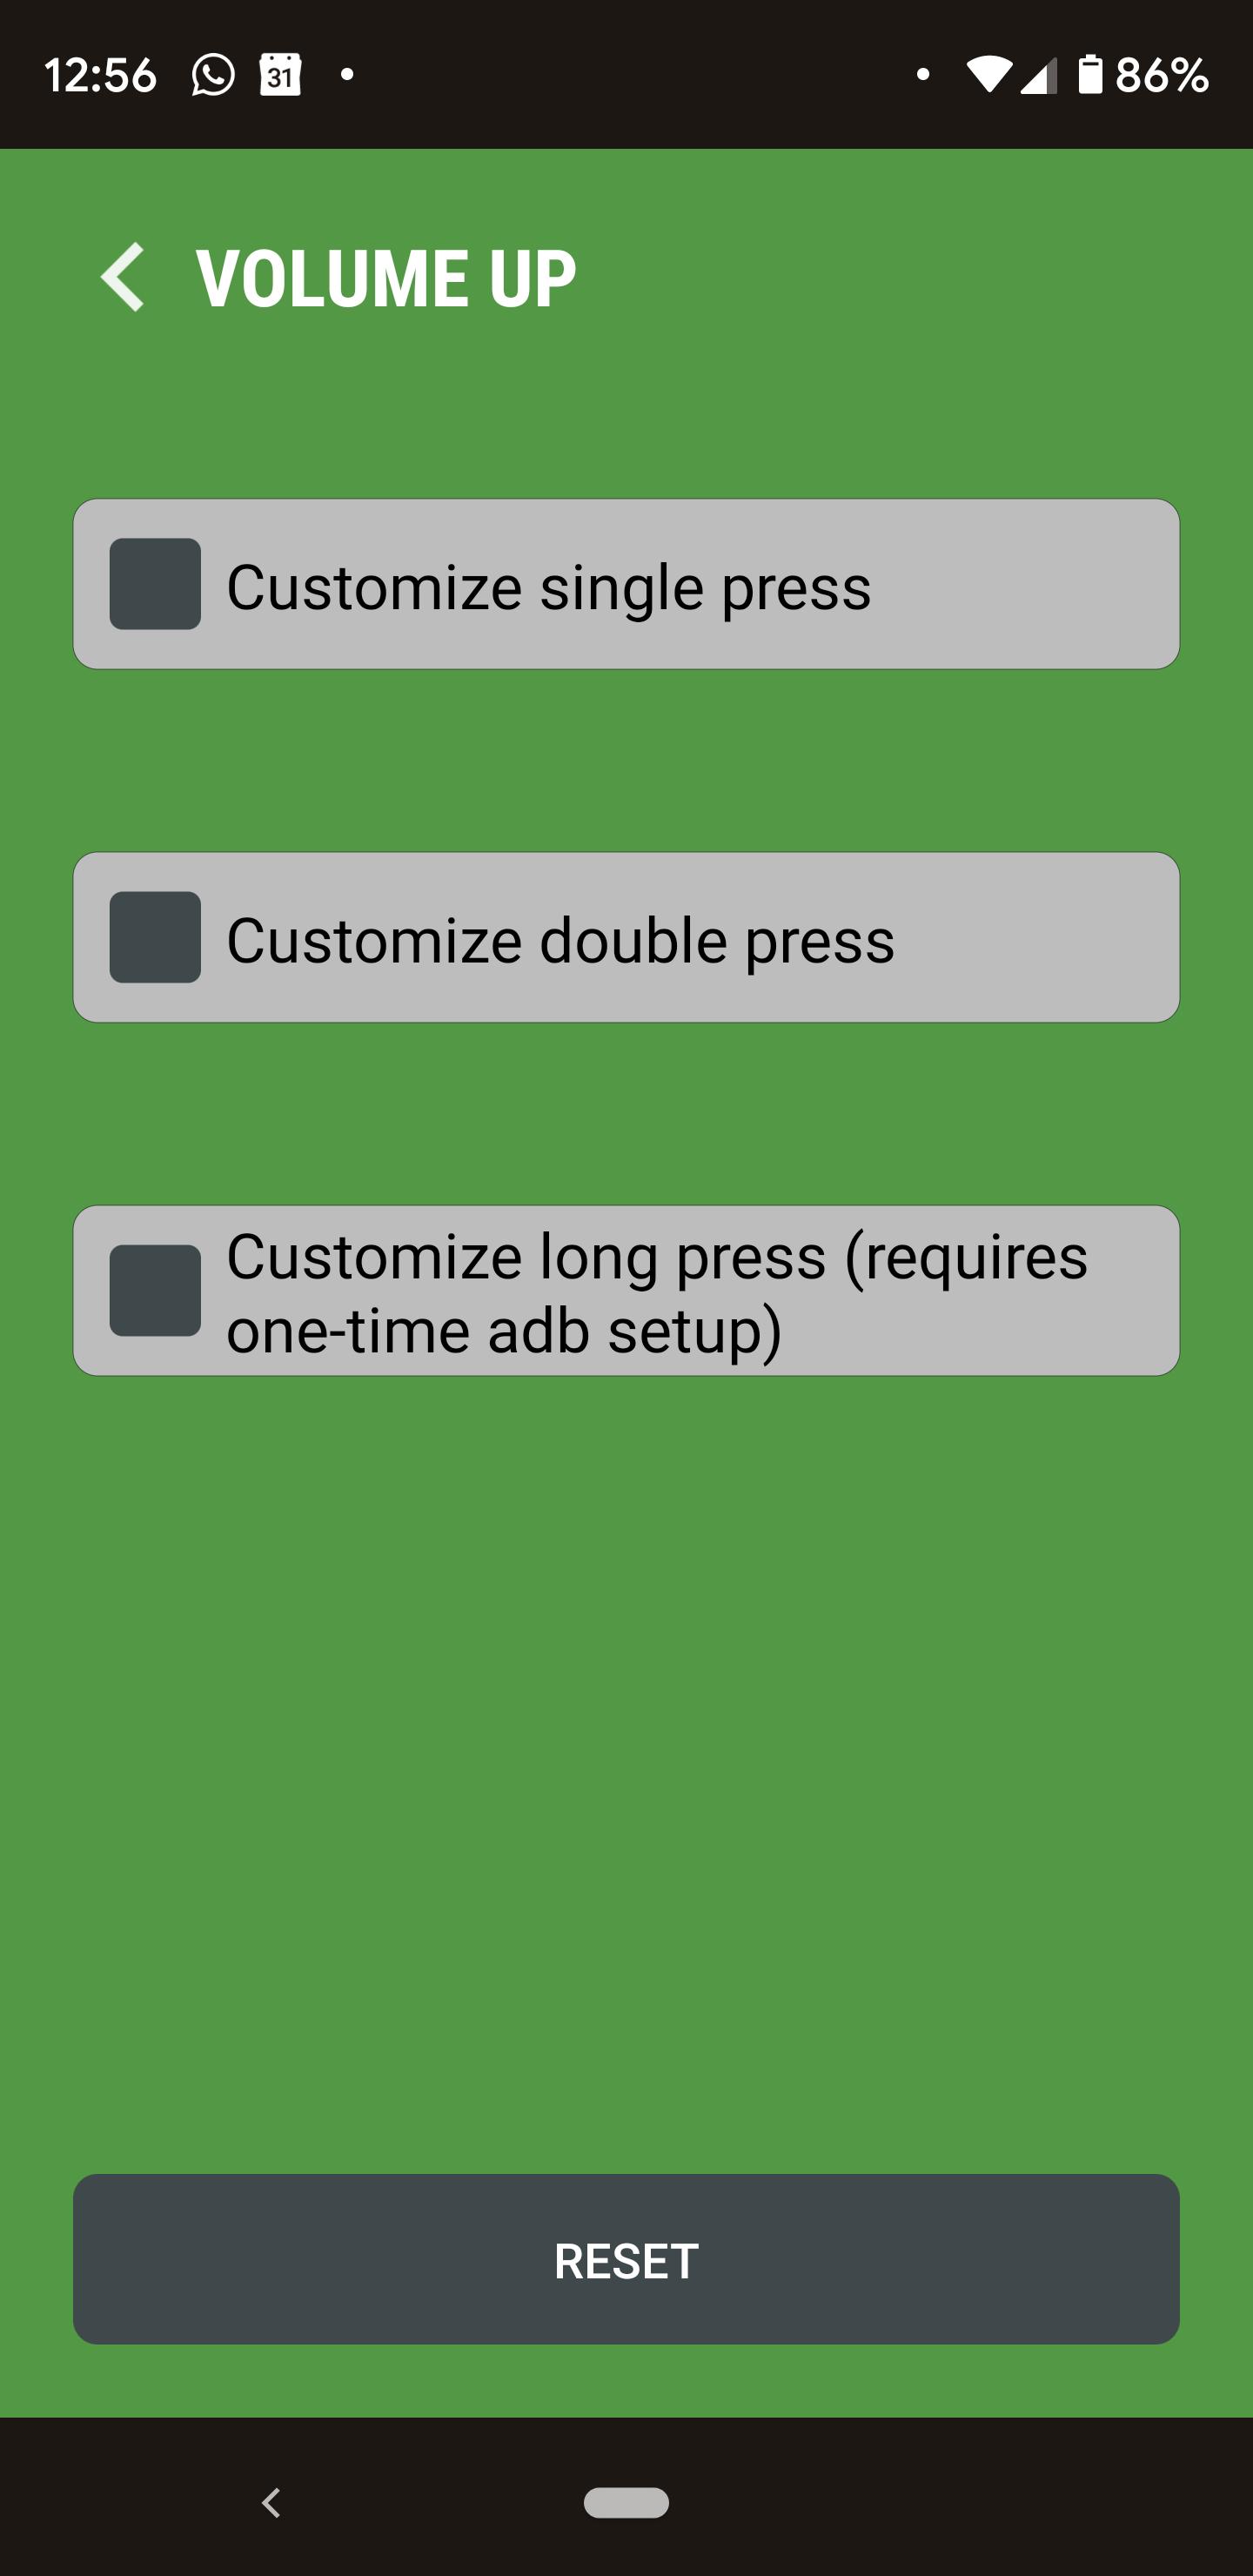 Update: Now in Tasker beta] SkipTrack and Next Track apps